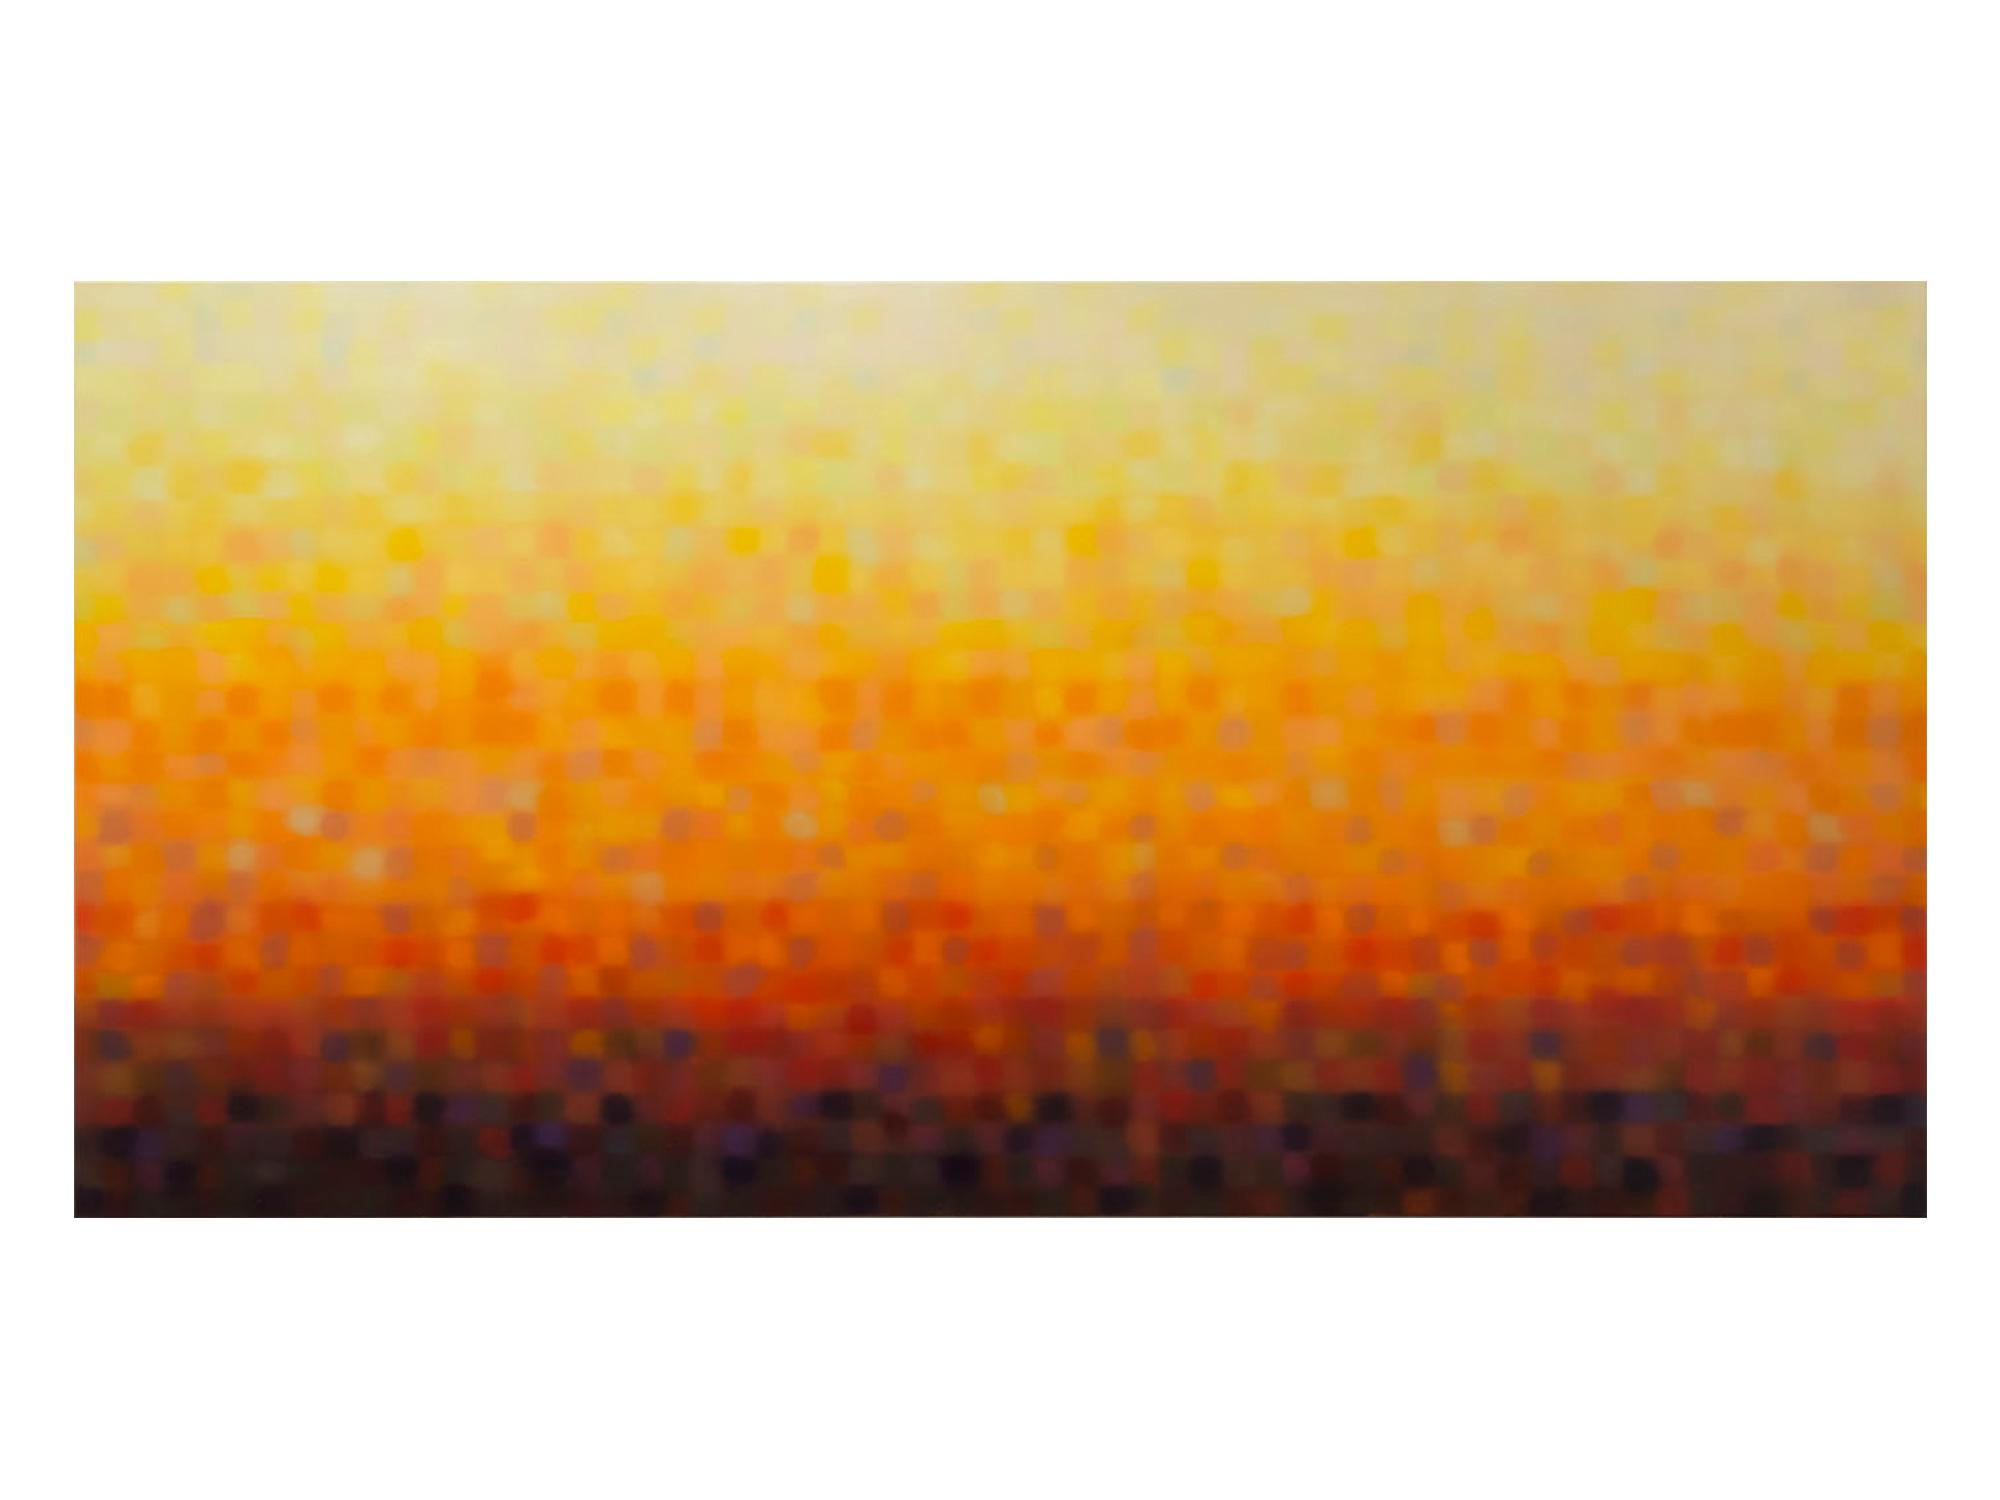 Matthew Johnson   Immersion (Sun) , 2014 oil on linen 120 x 240 cm   ARTIST BIO